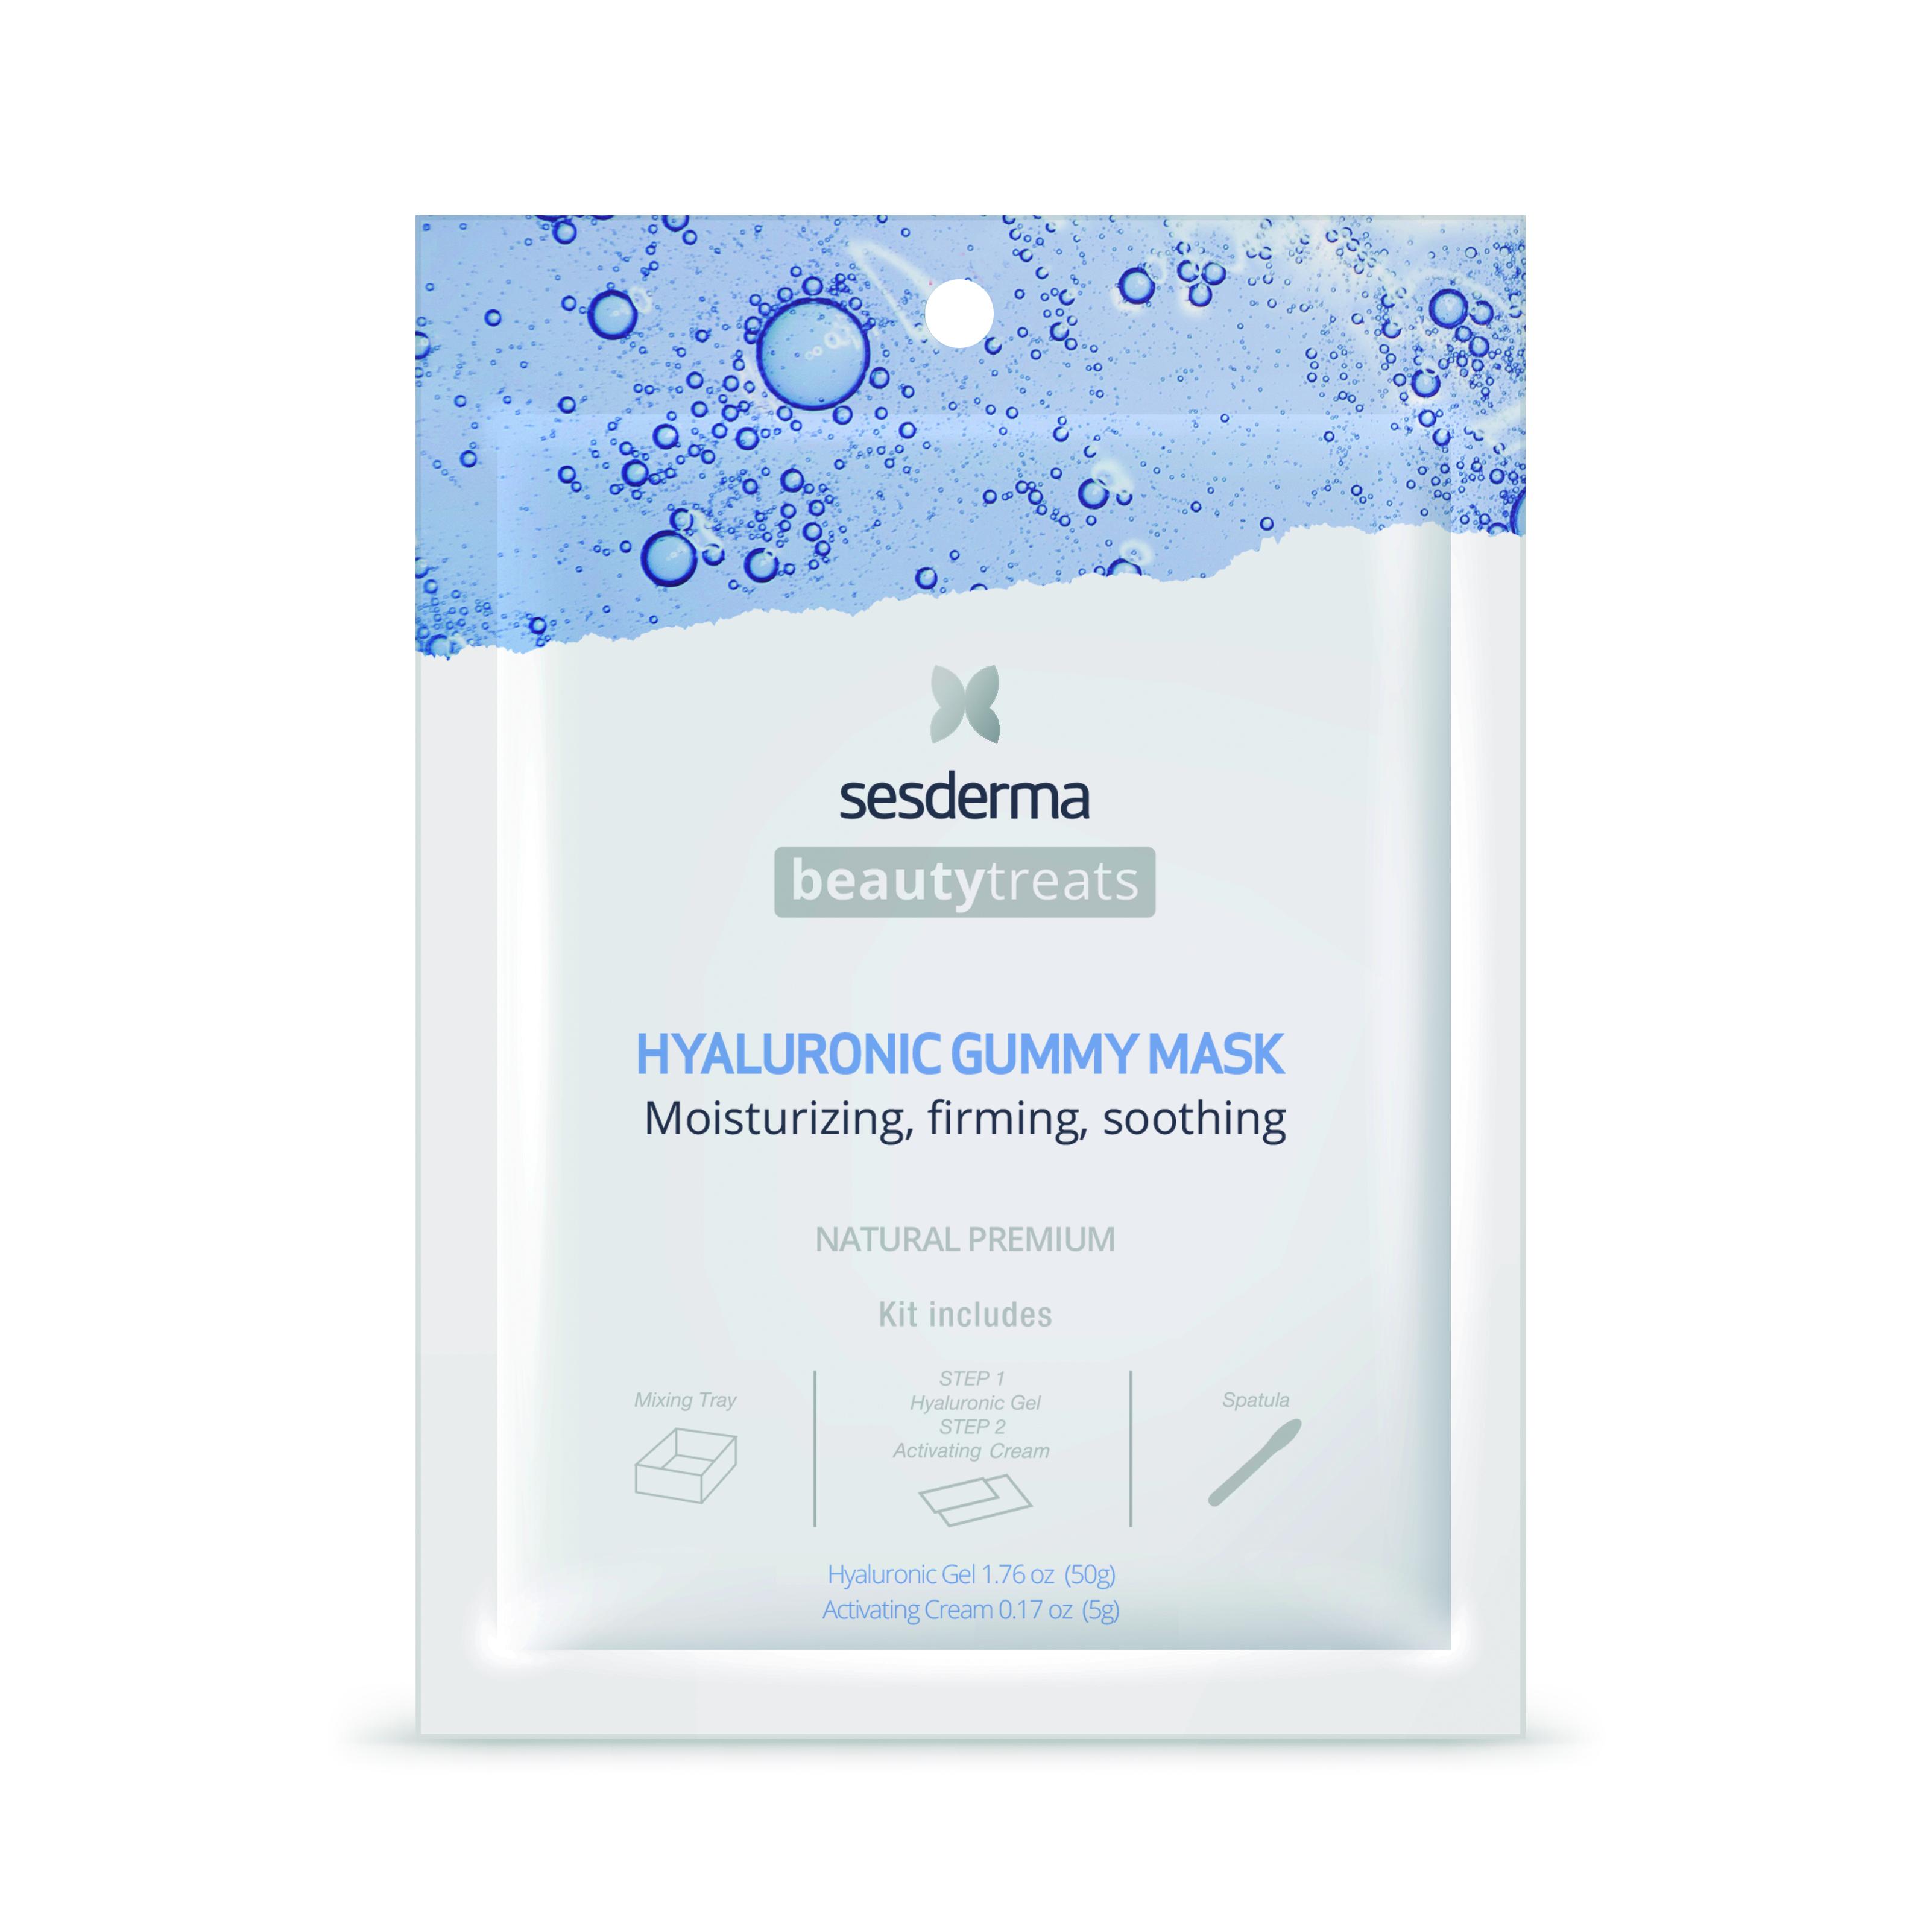 Sesderma Beauty Treats Hyaluronic Gummy Mask  Máscarilla facial hidratante 25 ml